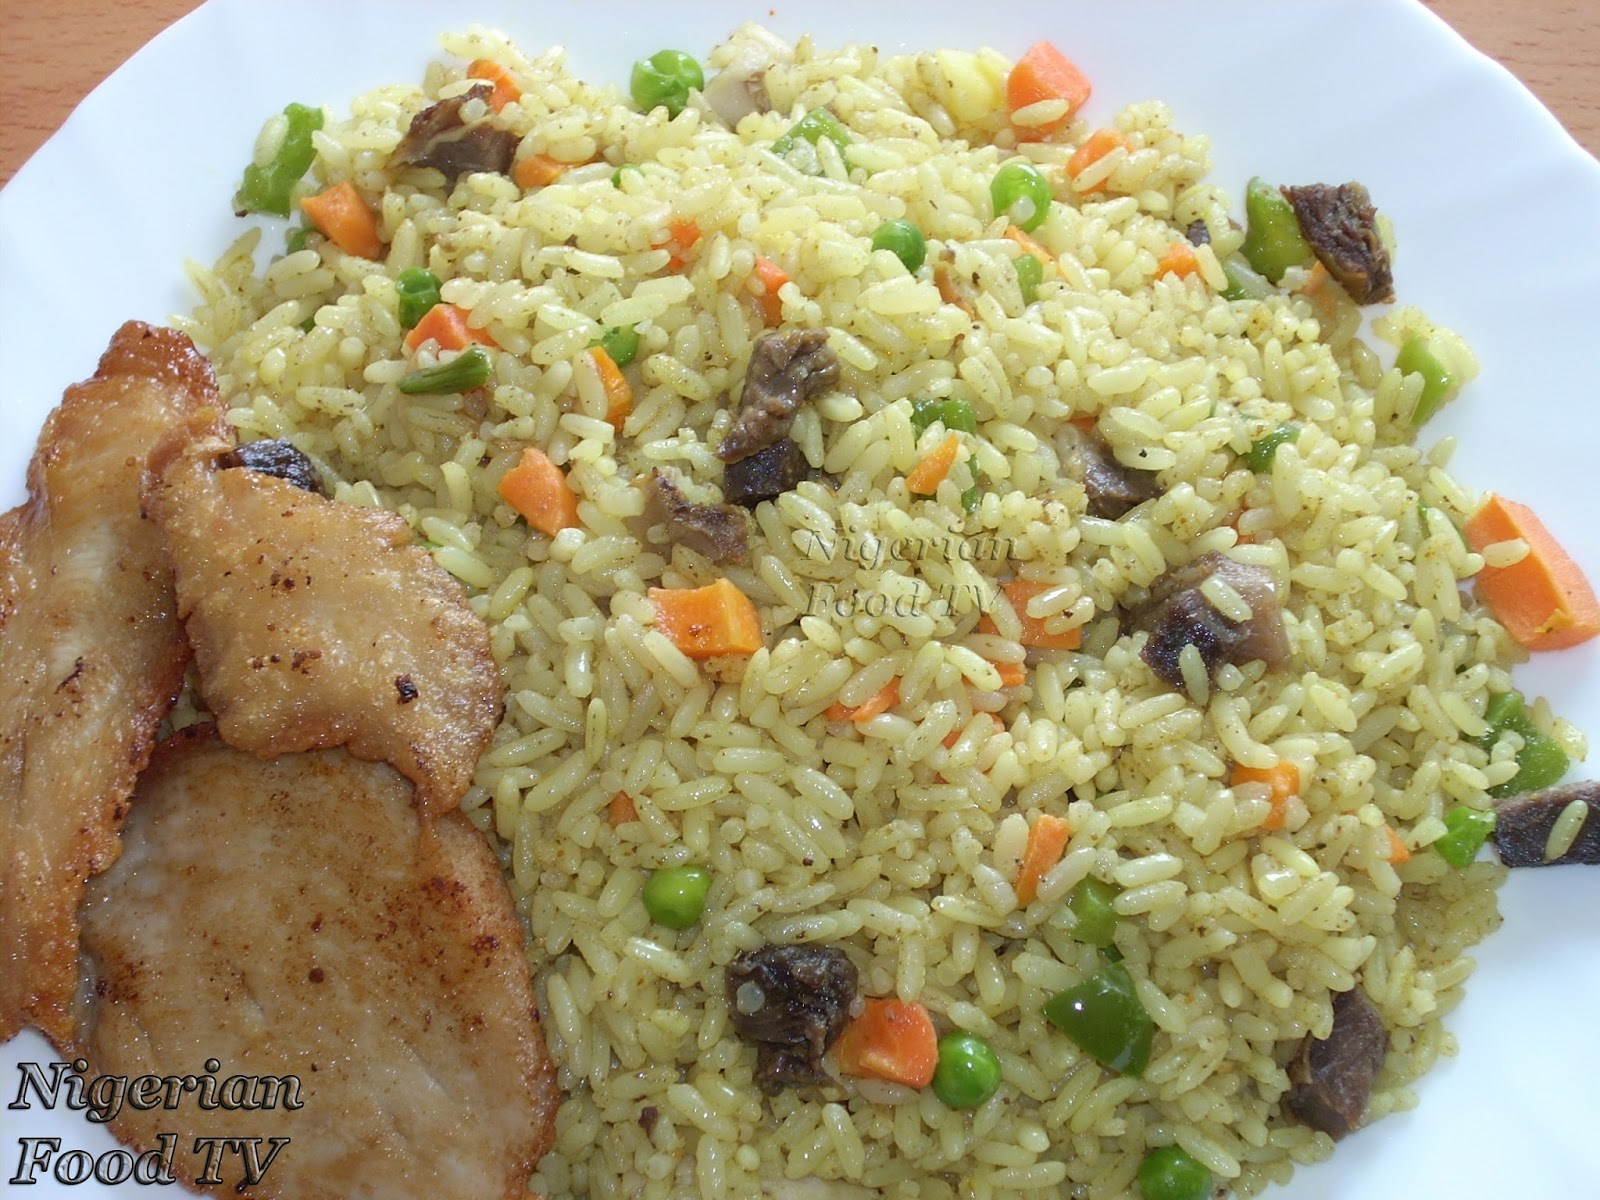 nigerian food recipes, nigerian recipes, nigerian food,Nigerian Food TV